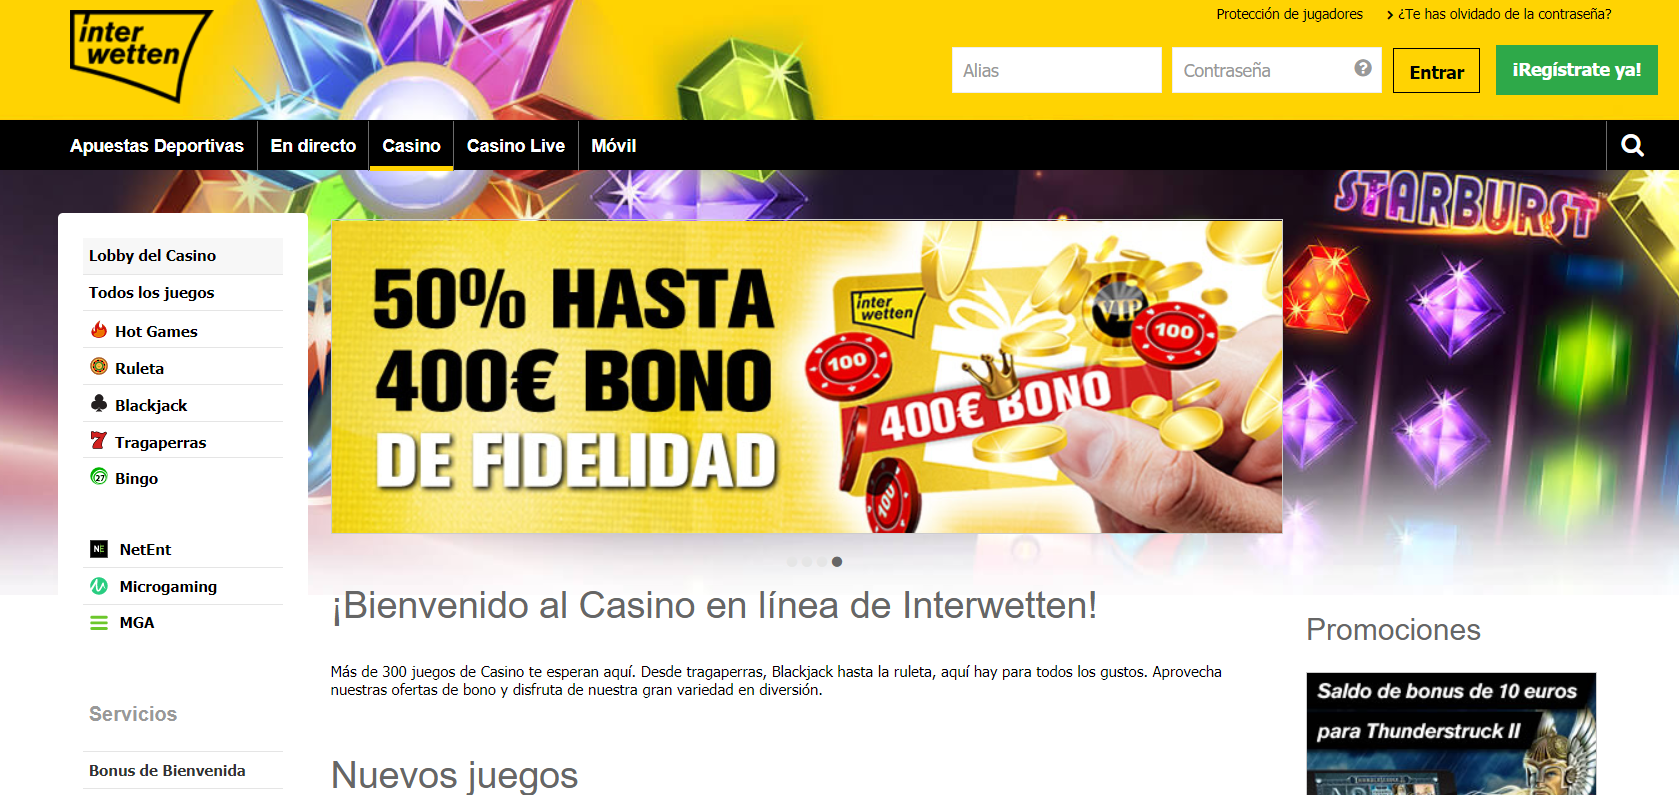 Www Interwetten Com Casino